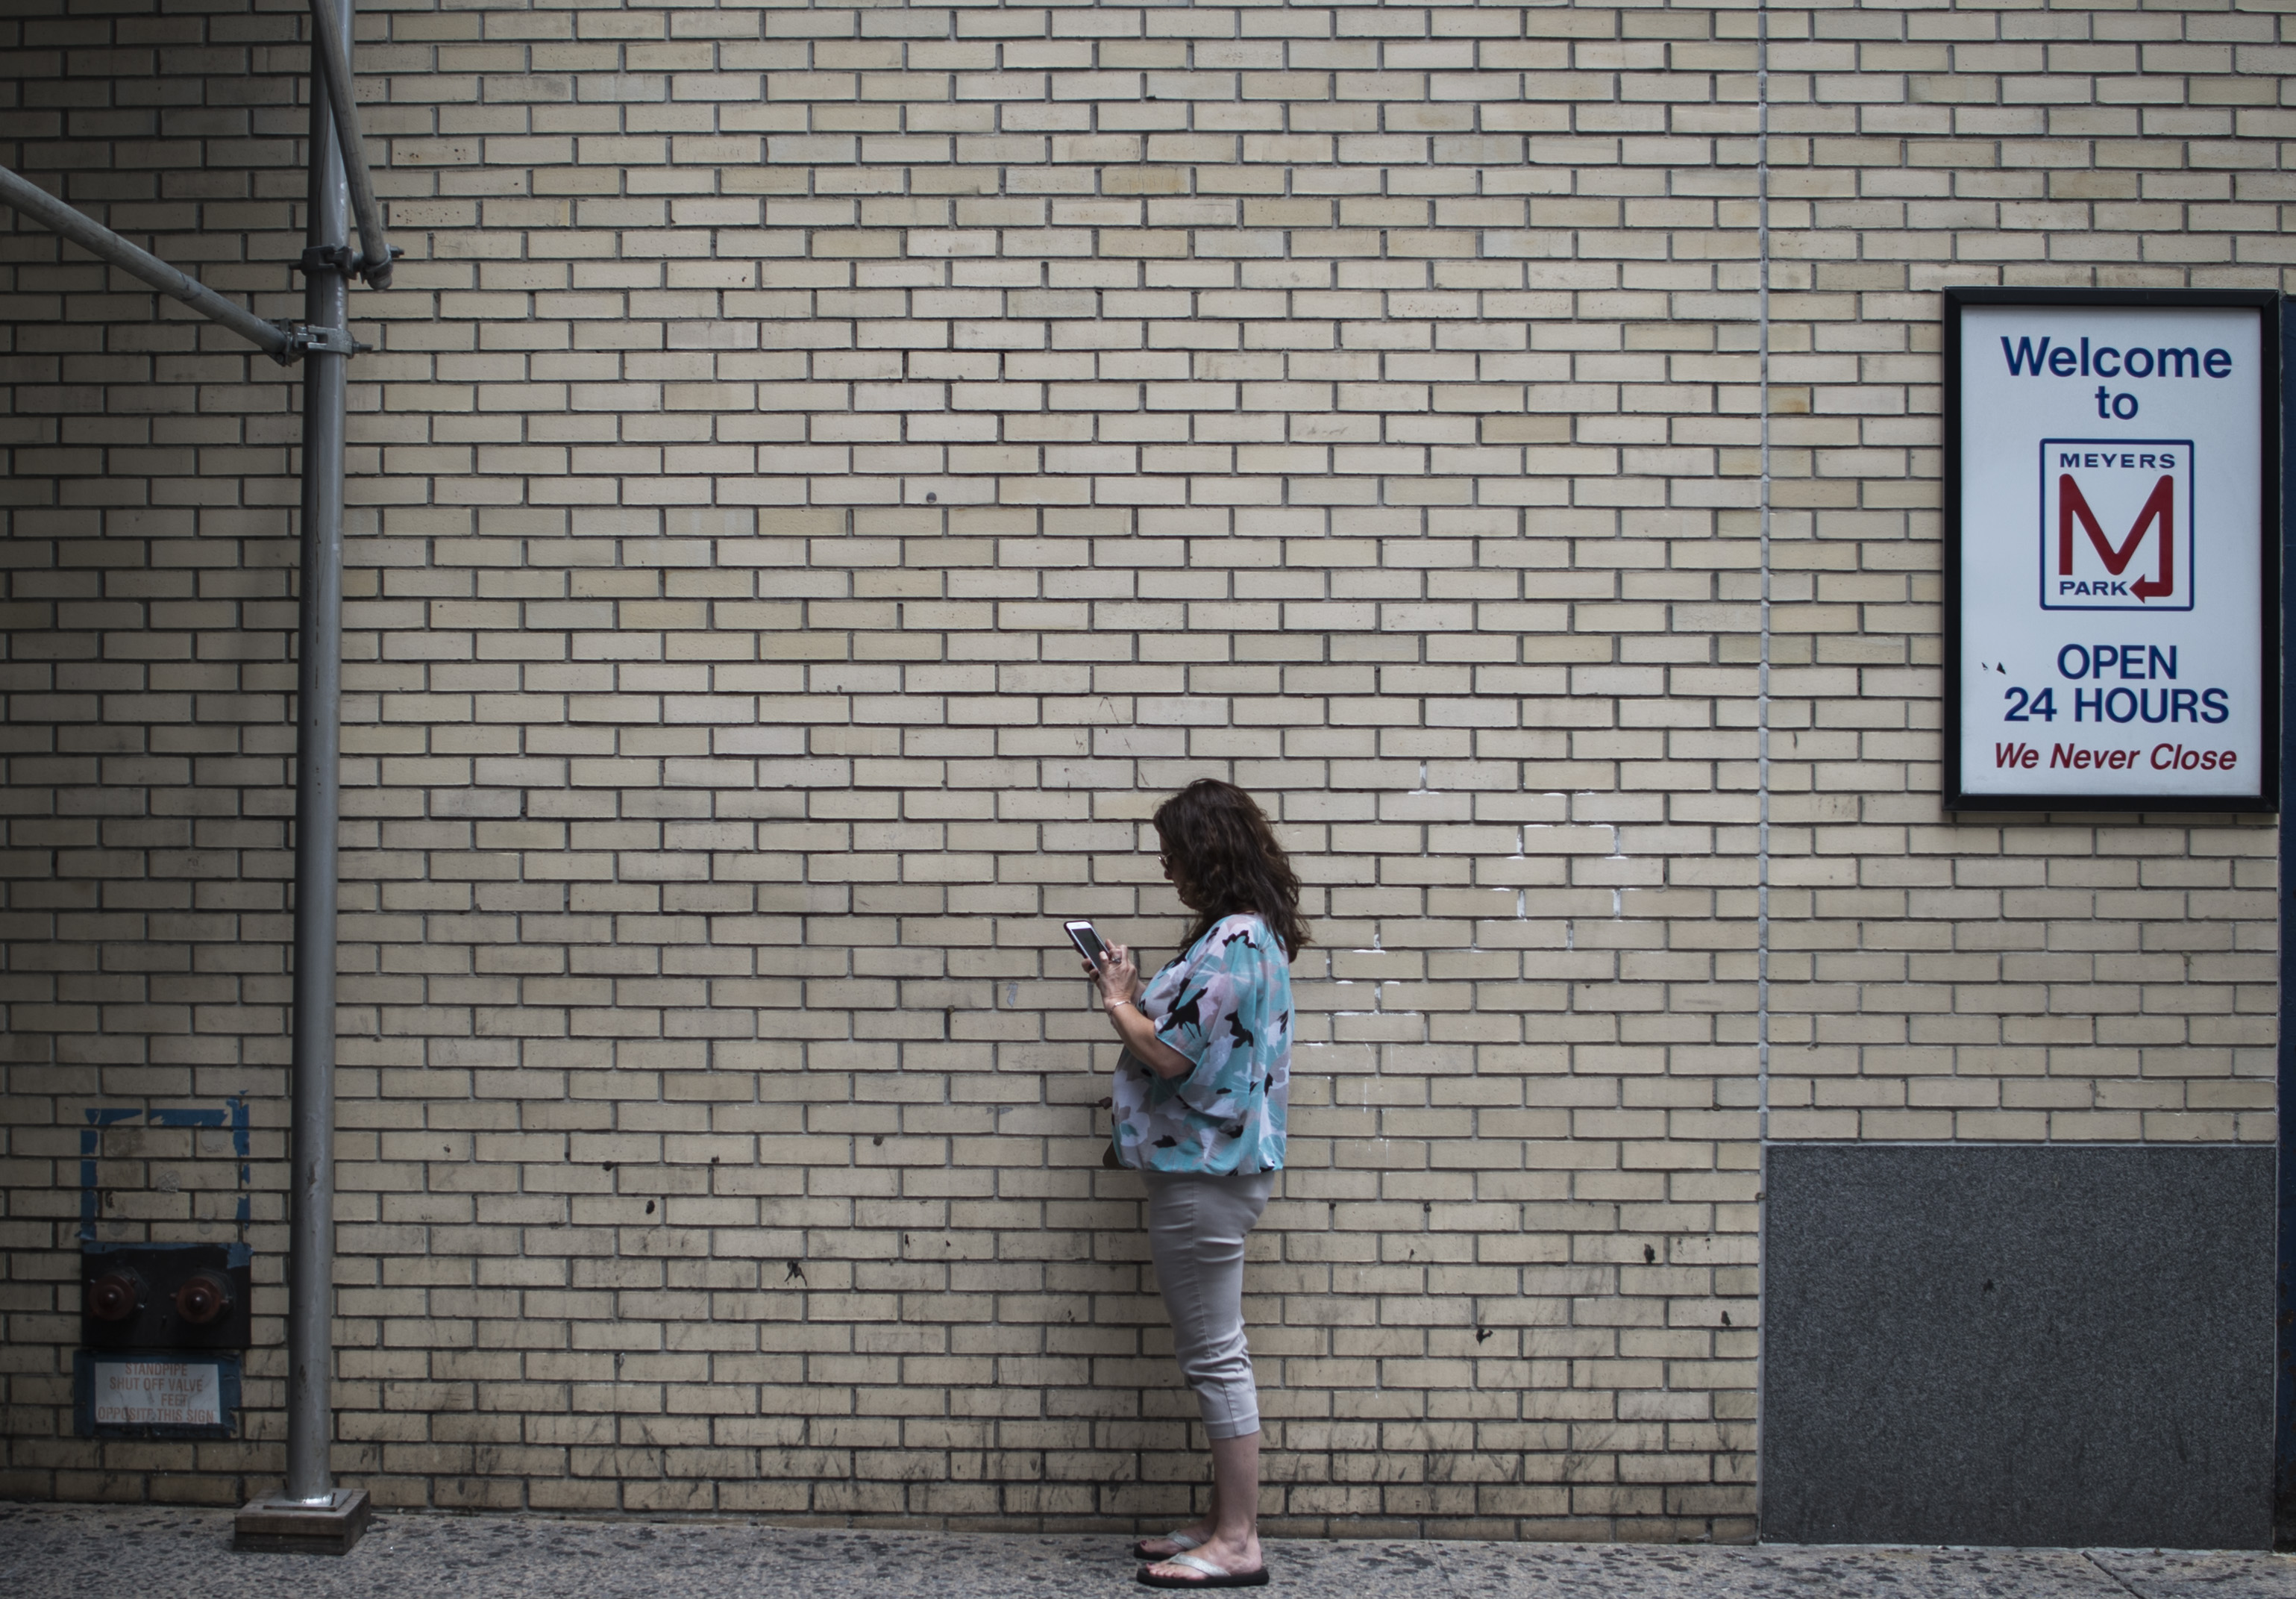 A woman looks at a phone near a wall.